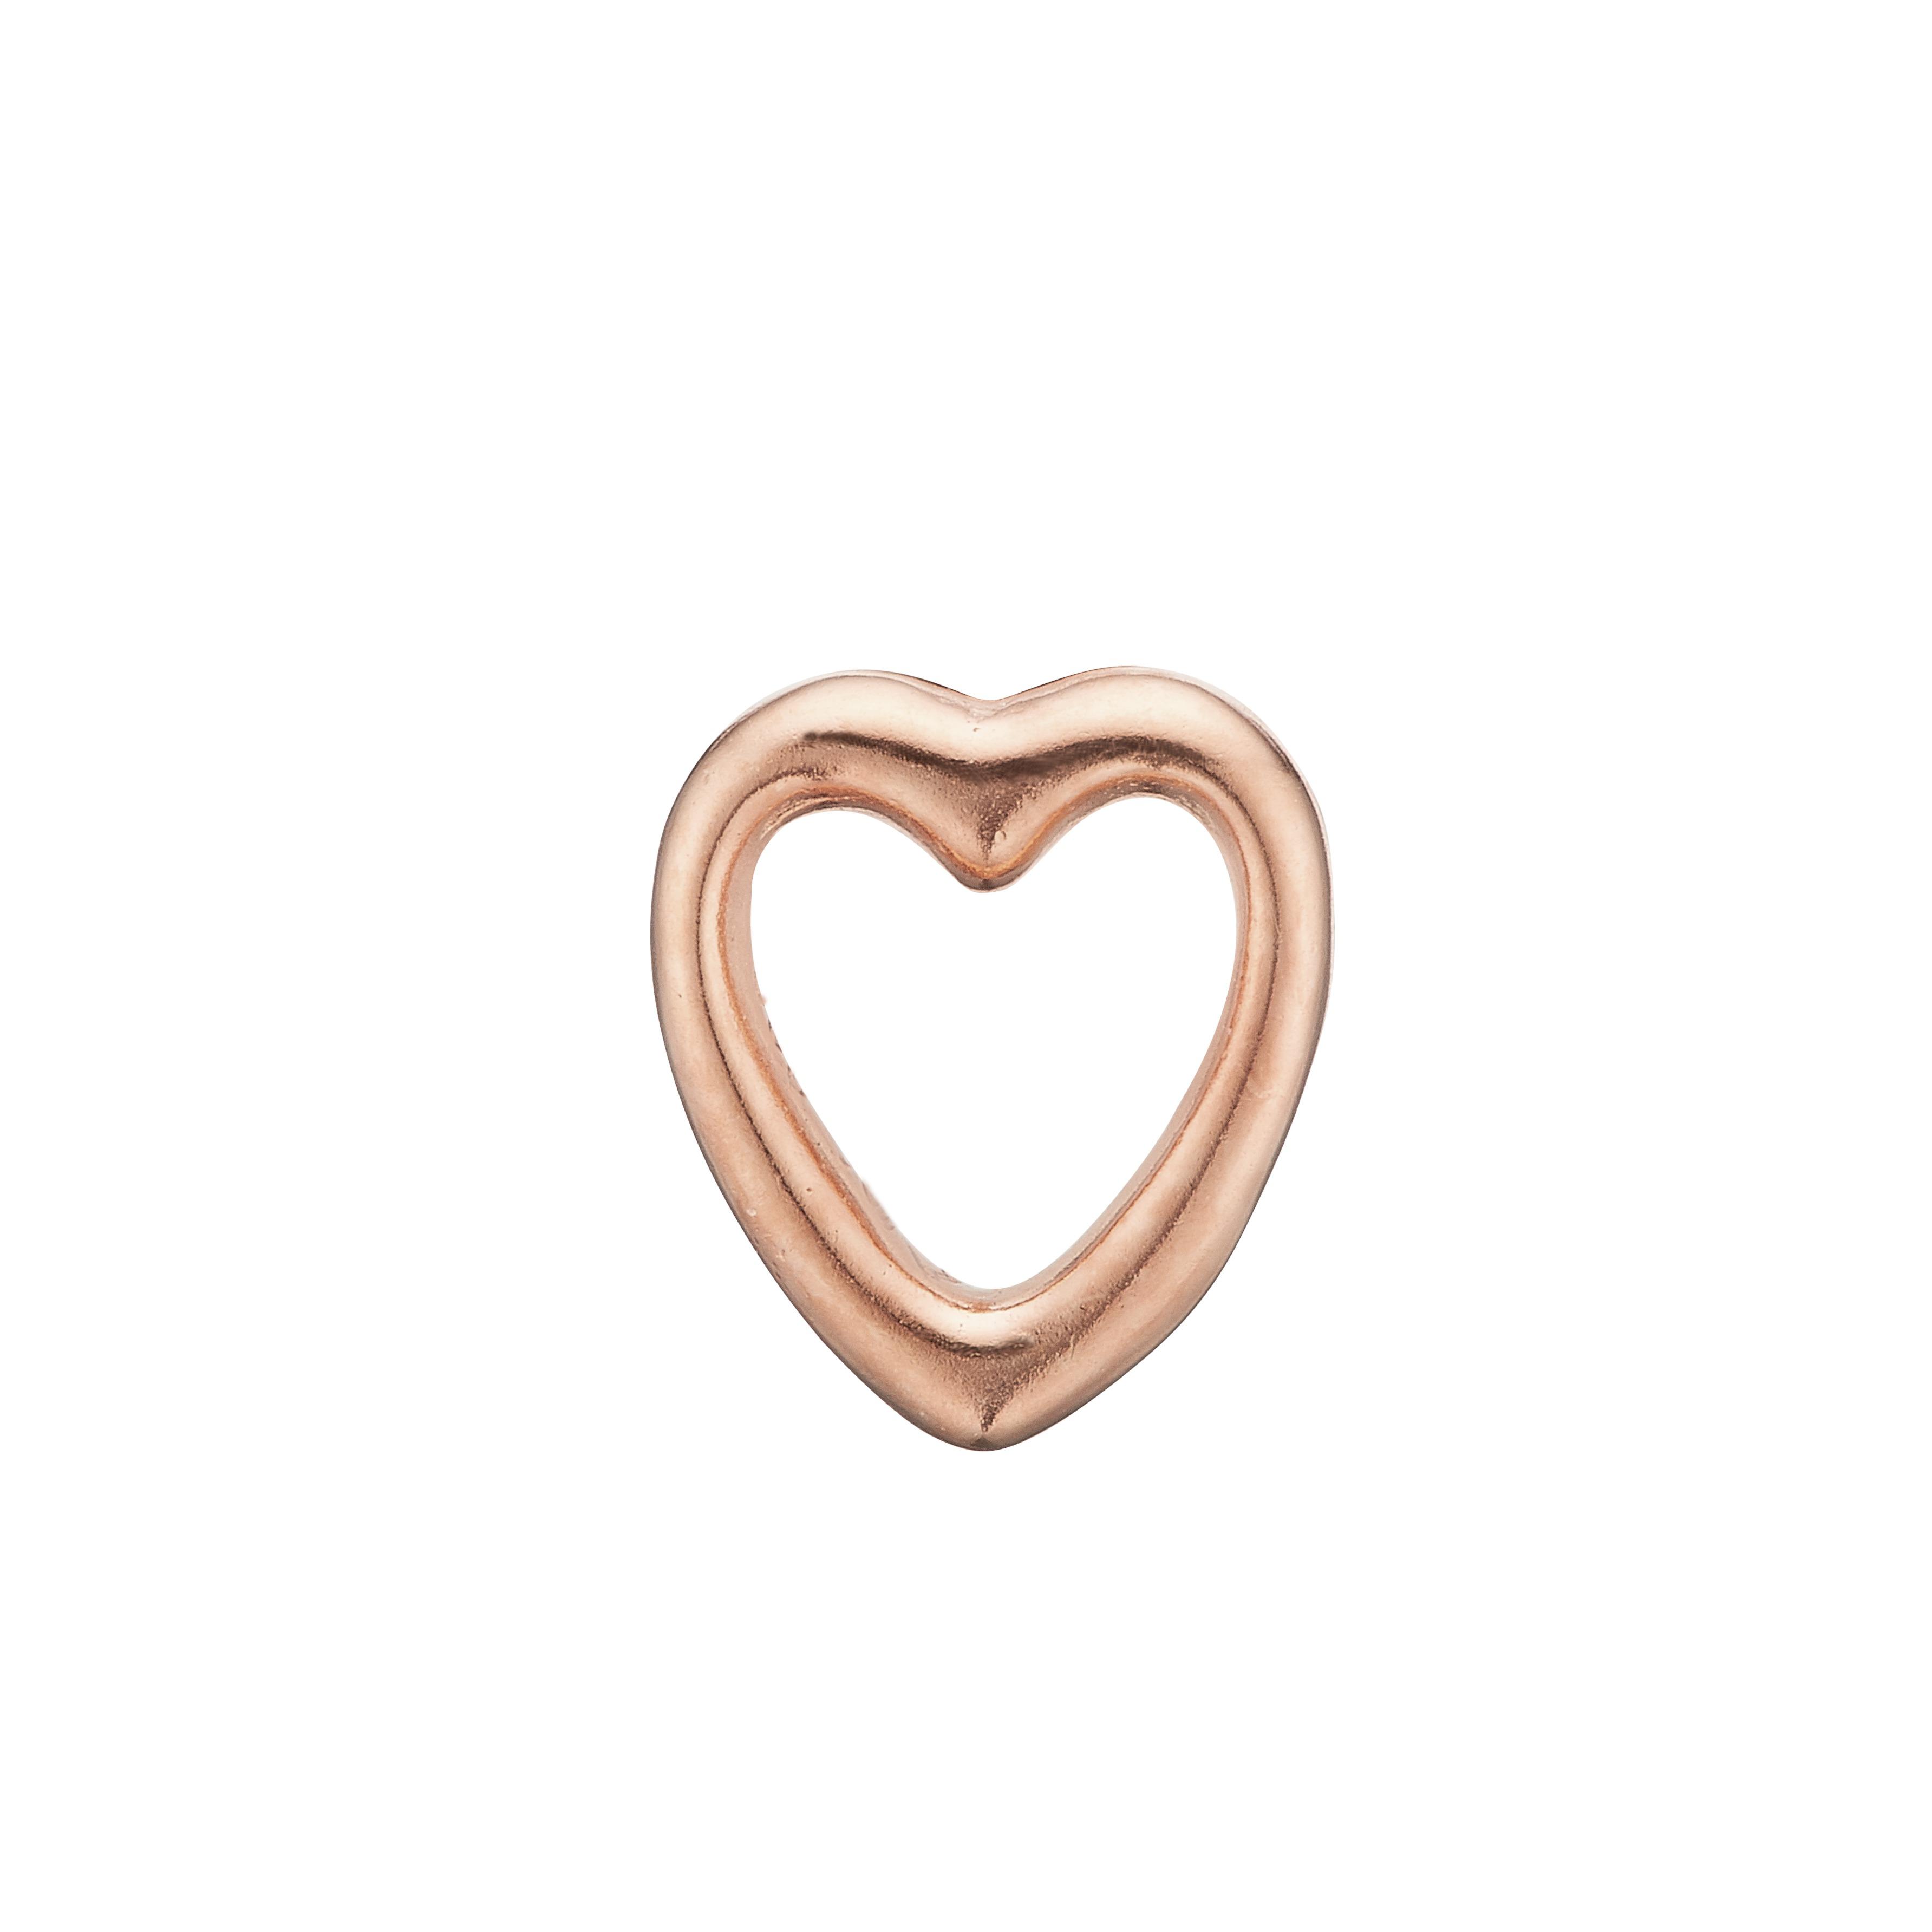 CHRISTINA Open Hearts - 671-R05